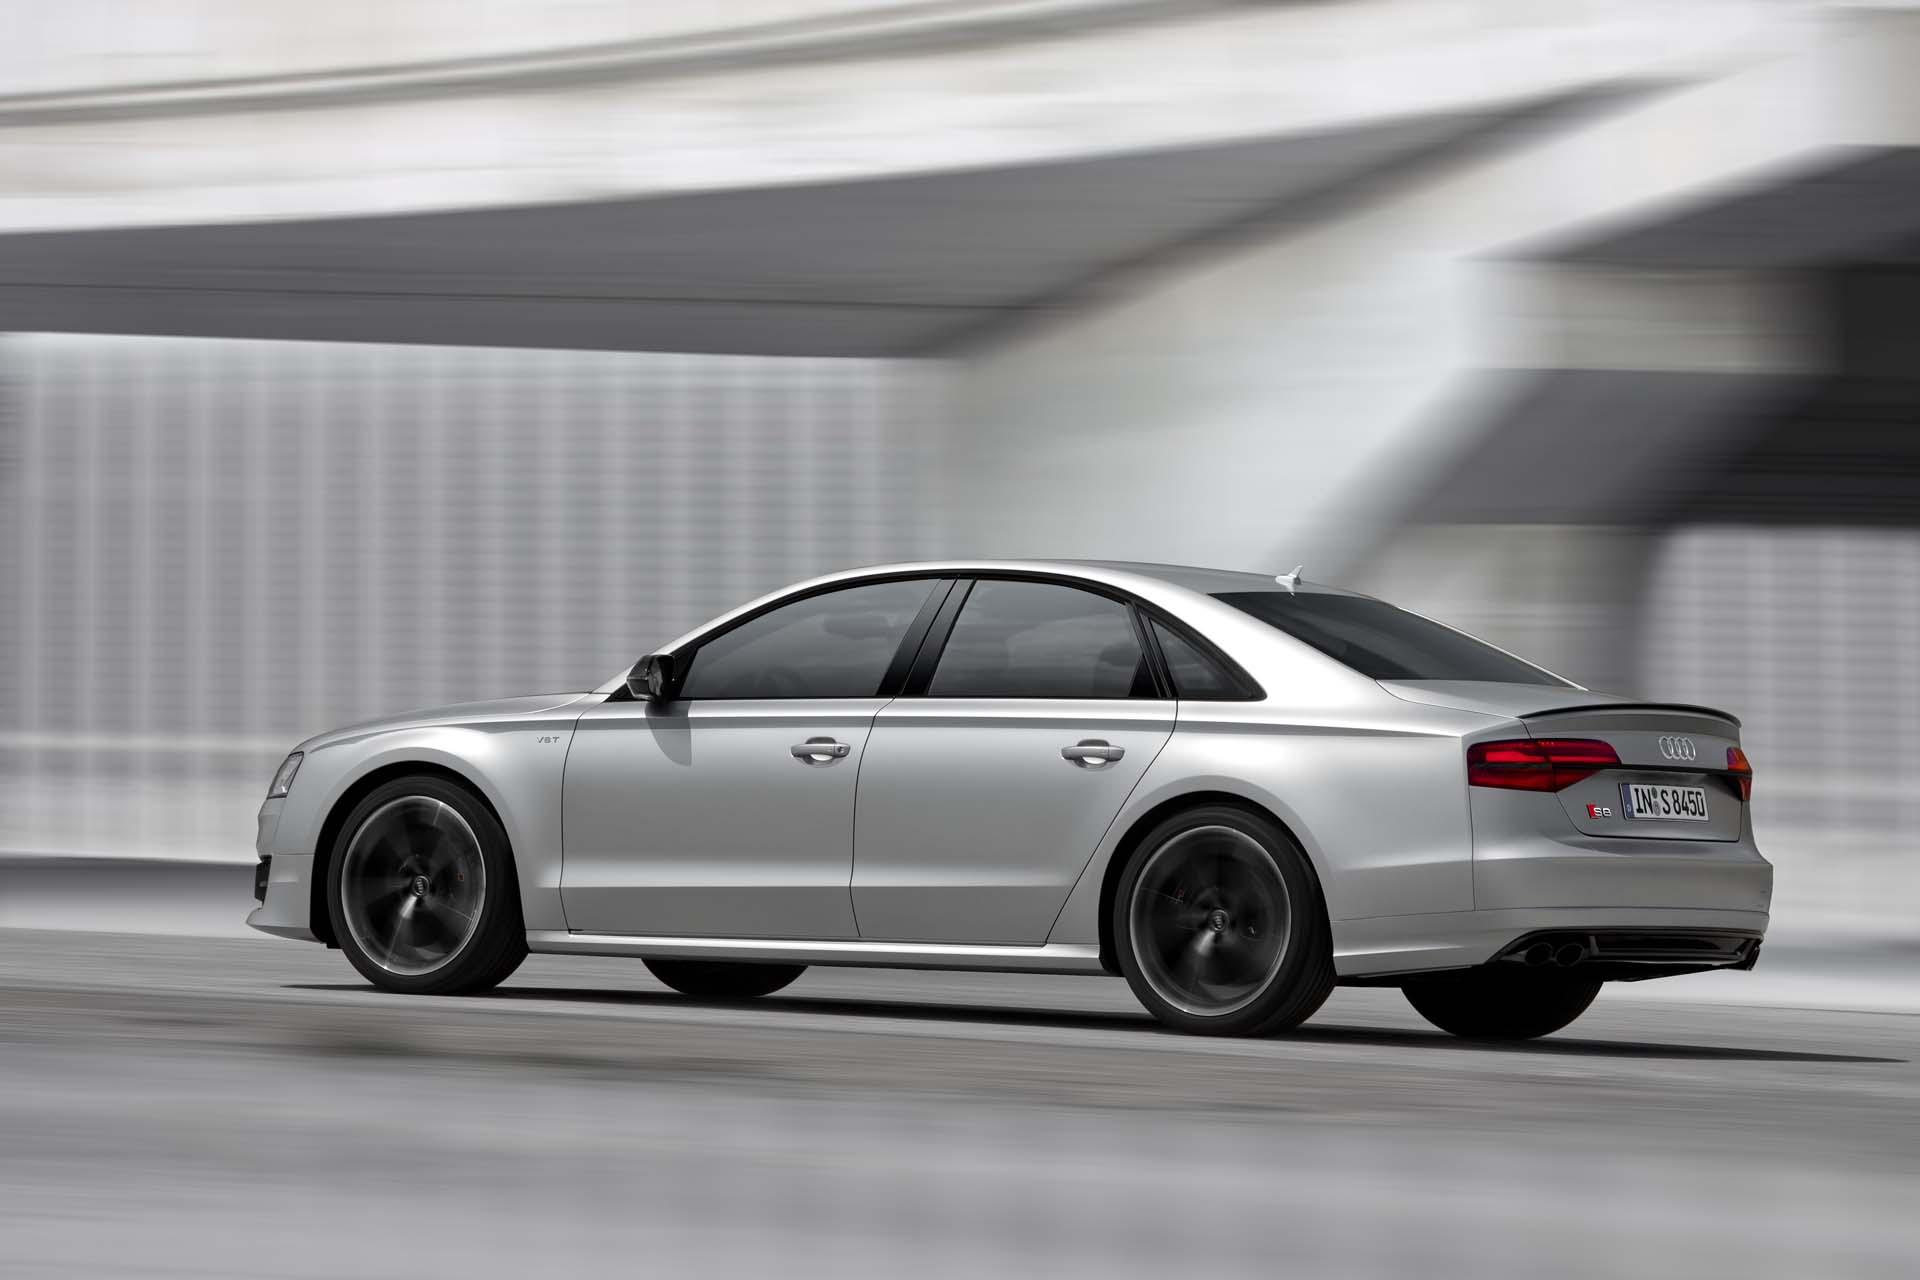 Kelebihan Kekurangan Audi S8 2018 Review